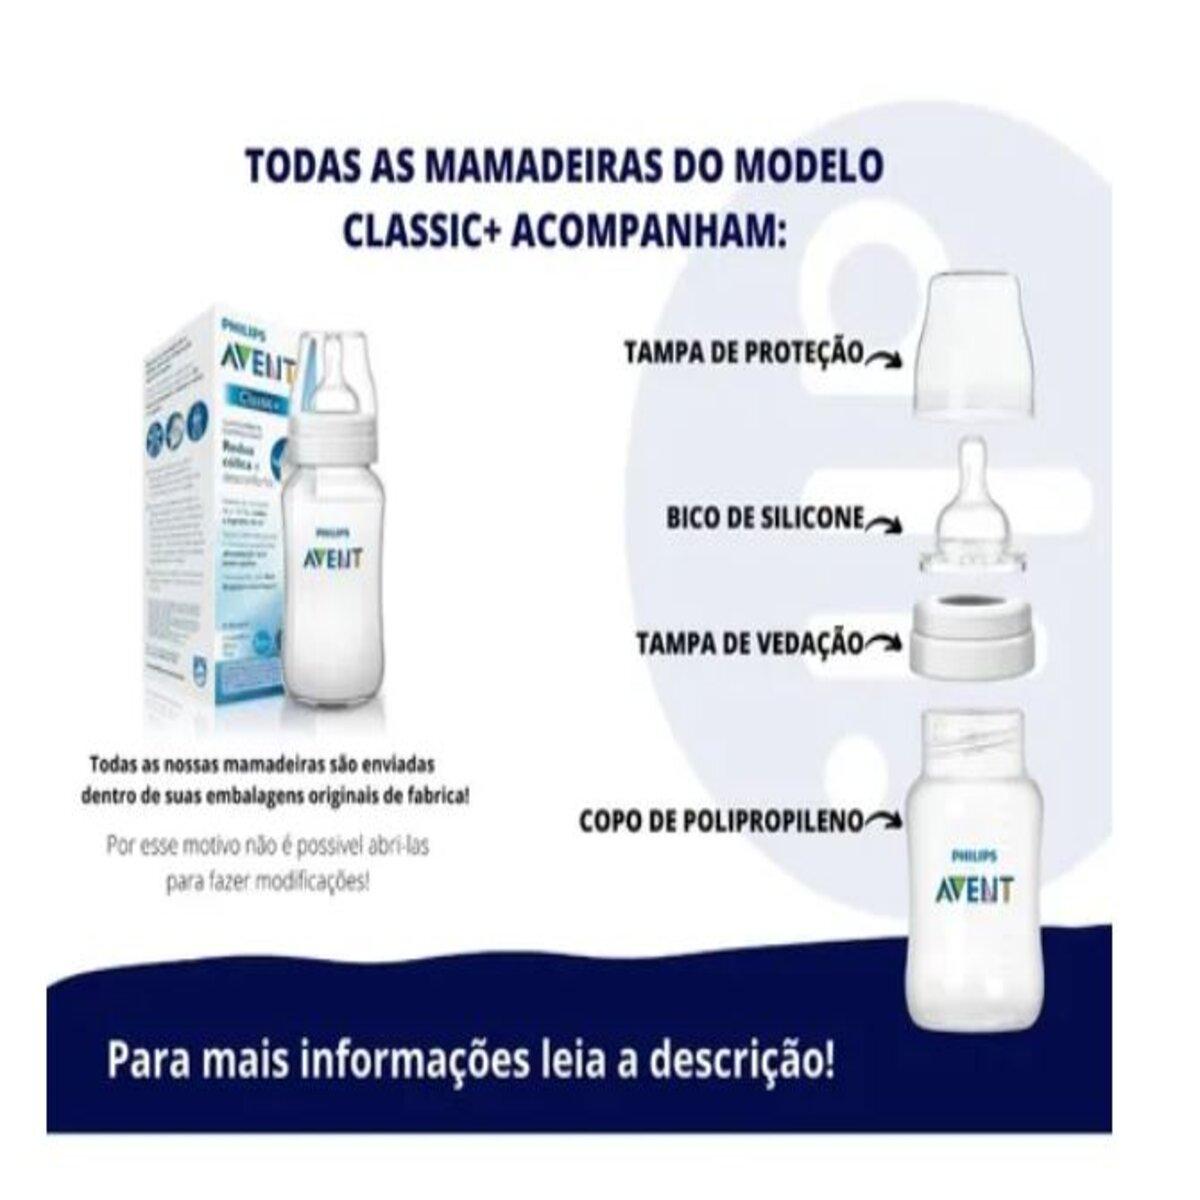 Mamadeira Philips Avent 330ml Classic - Rosa